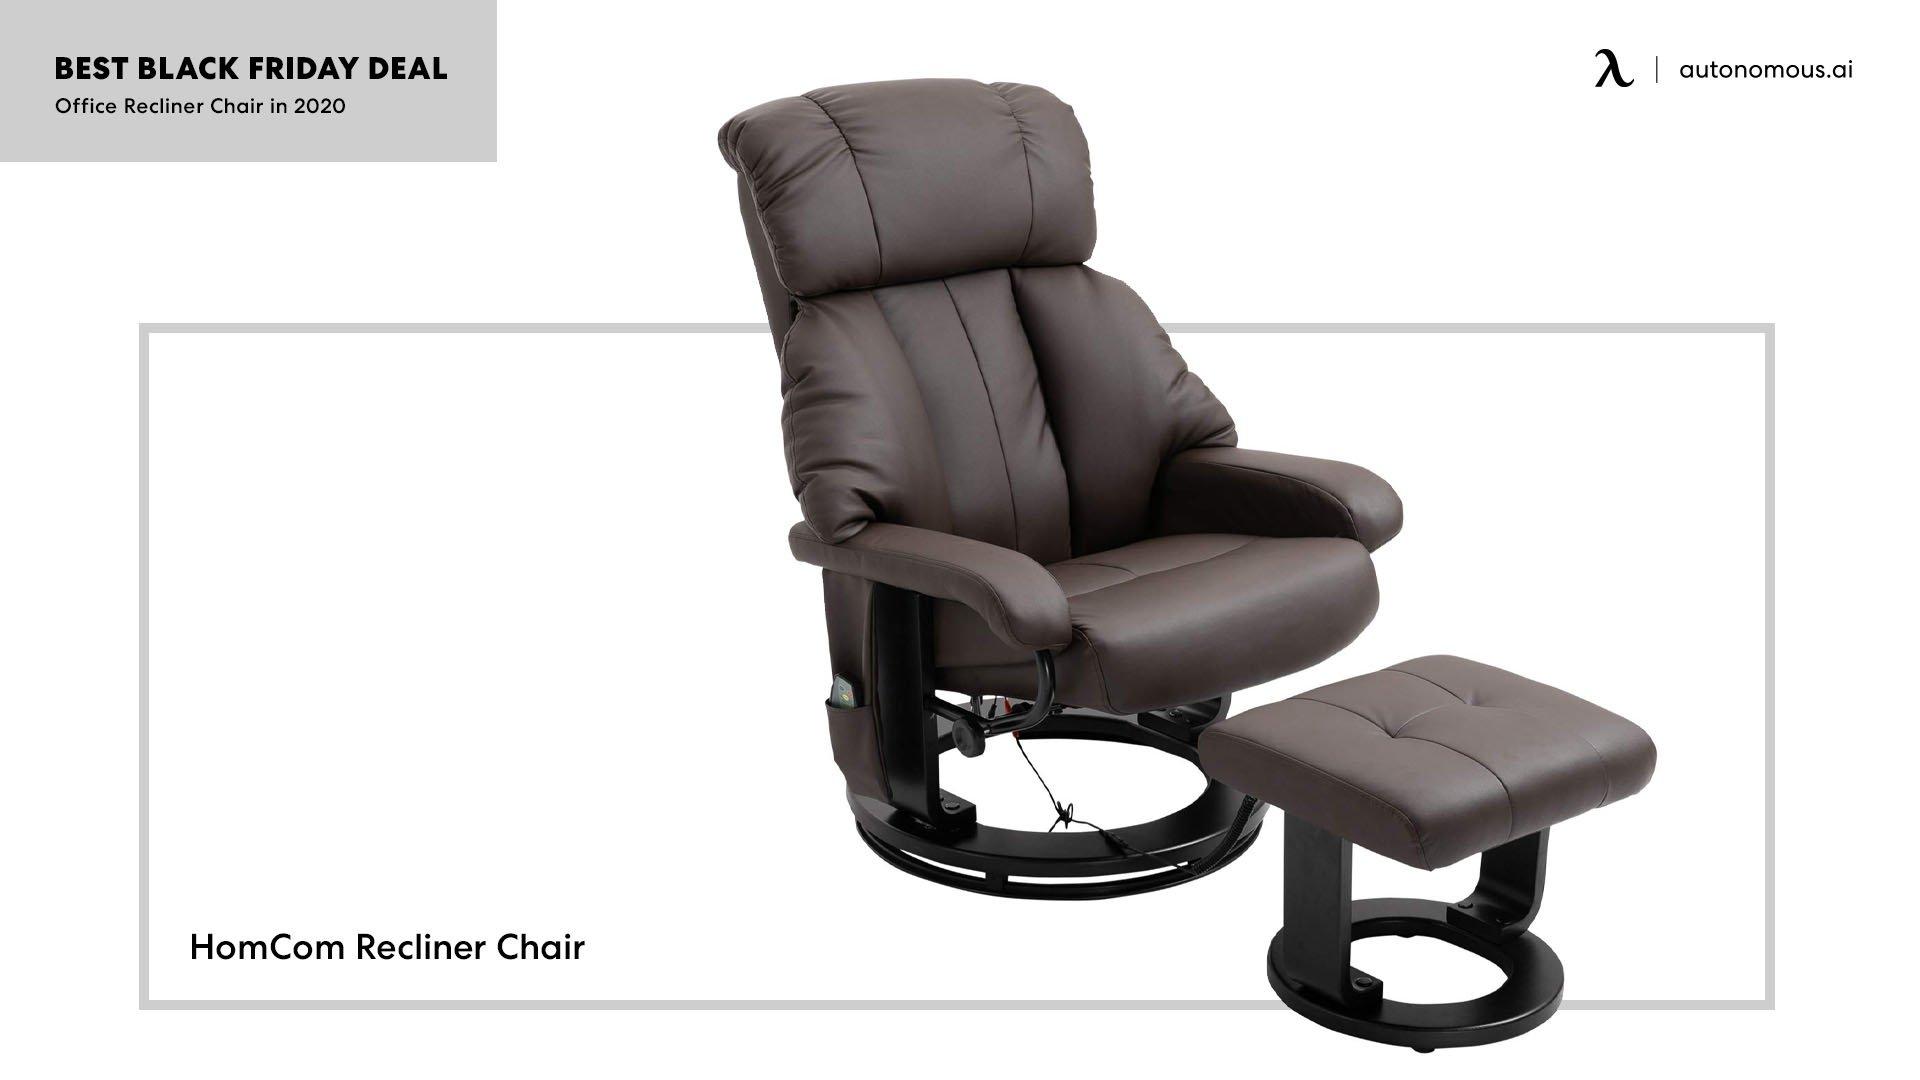 HomCom Recliner Chair